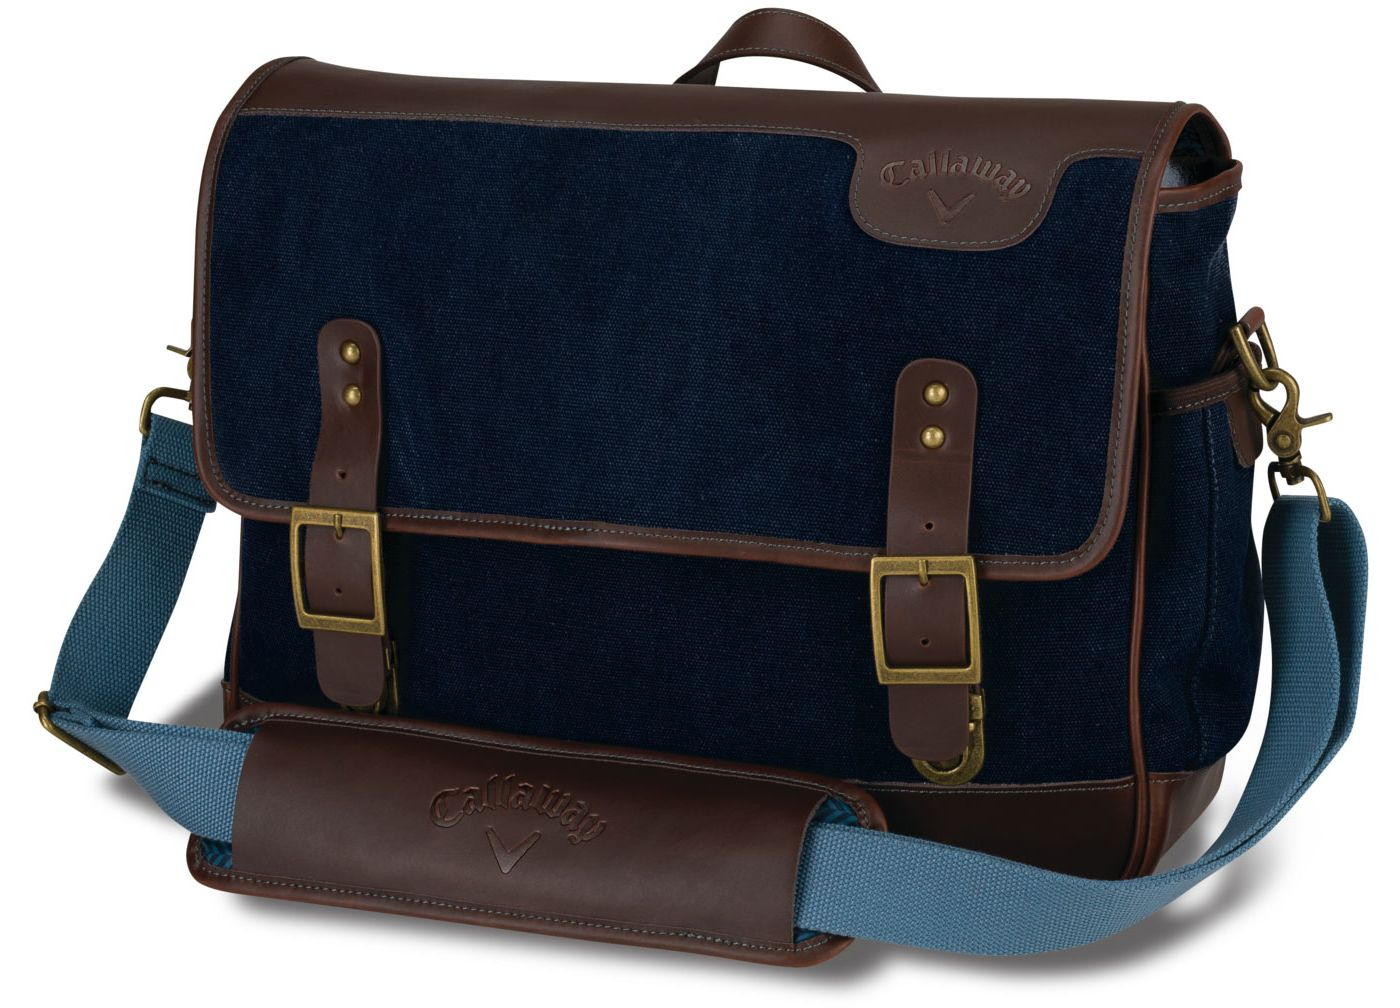 Callaway Tour Authentic Messenger Bag